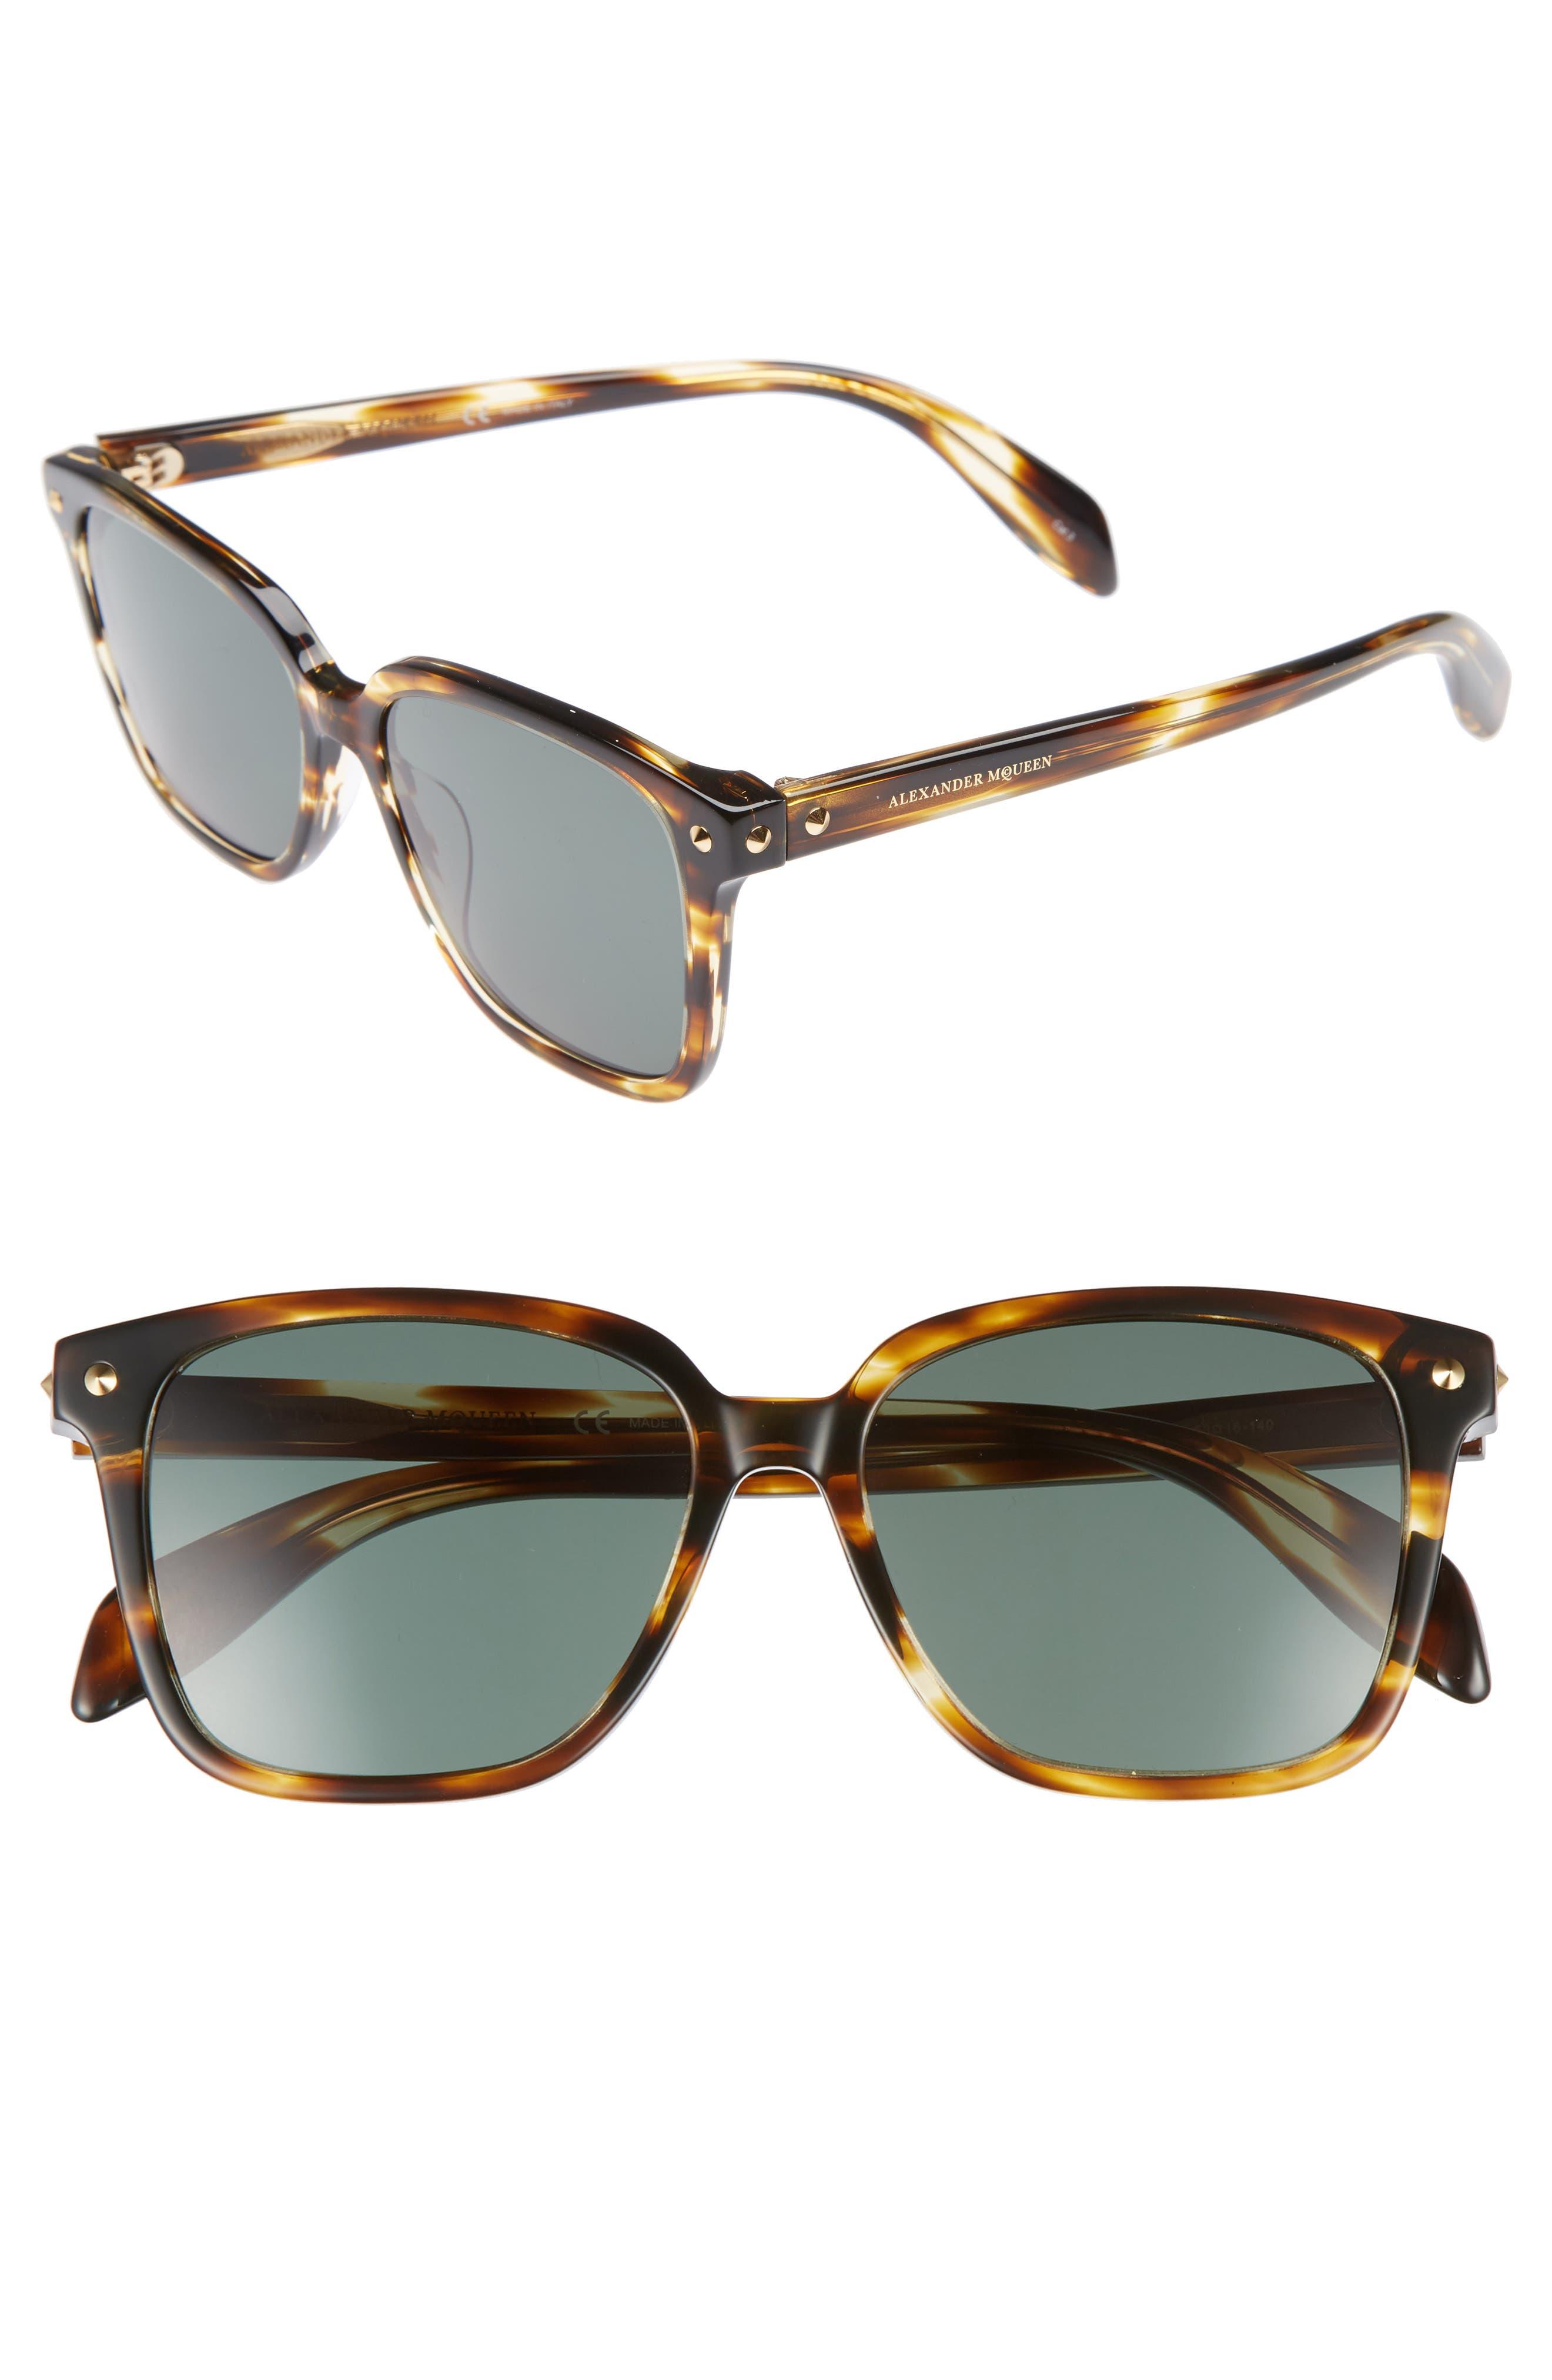 Alternate Image 1 Selected - Alexander McQueen 53mm Square Sunglasses